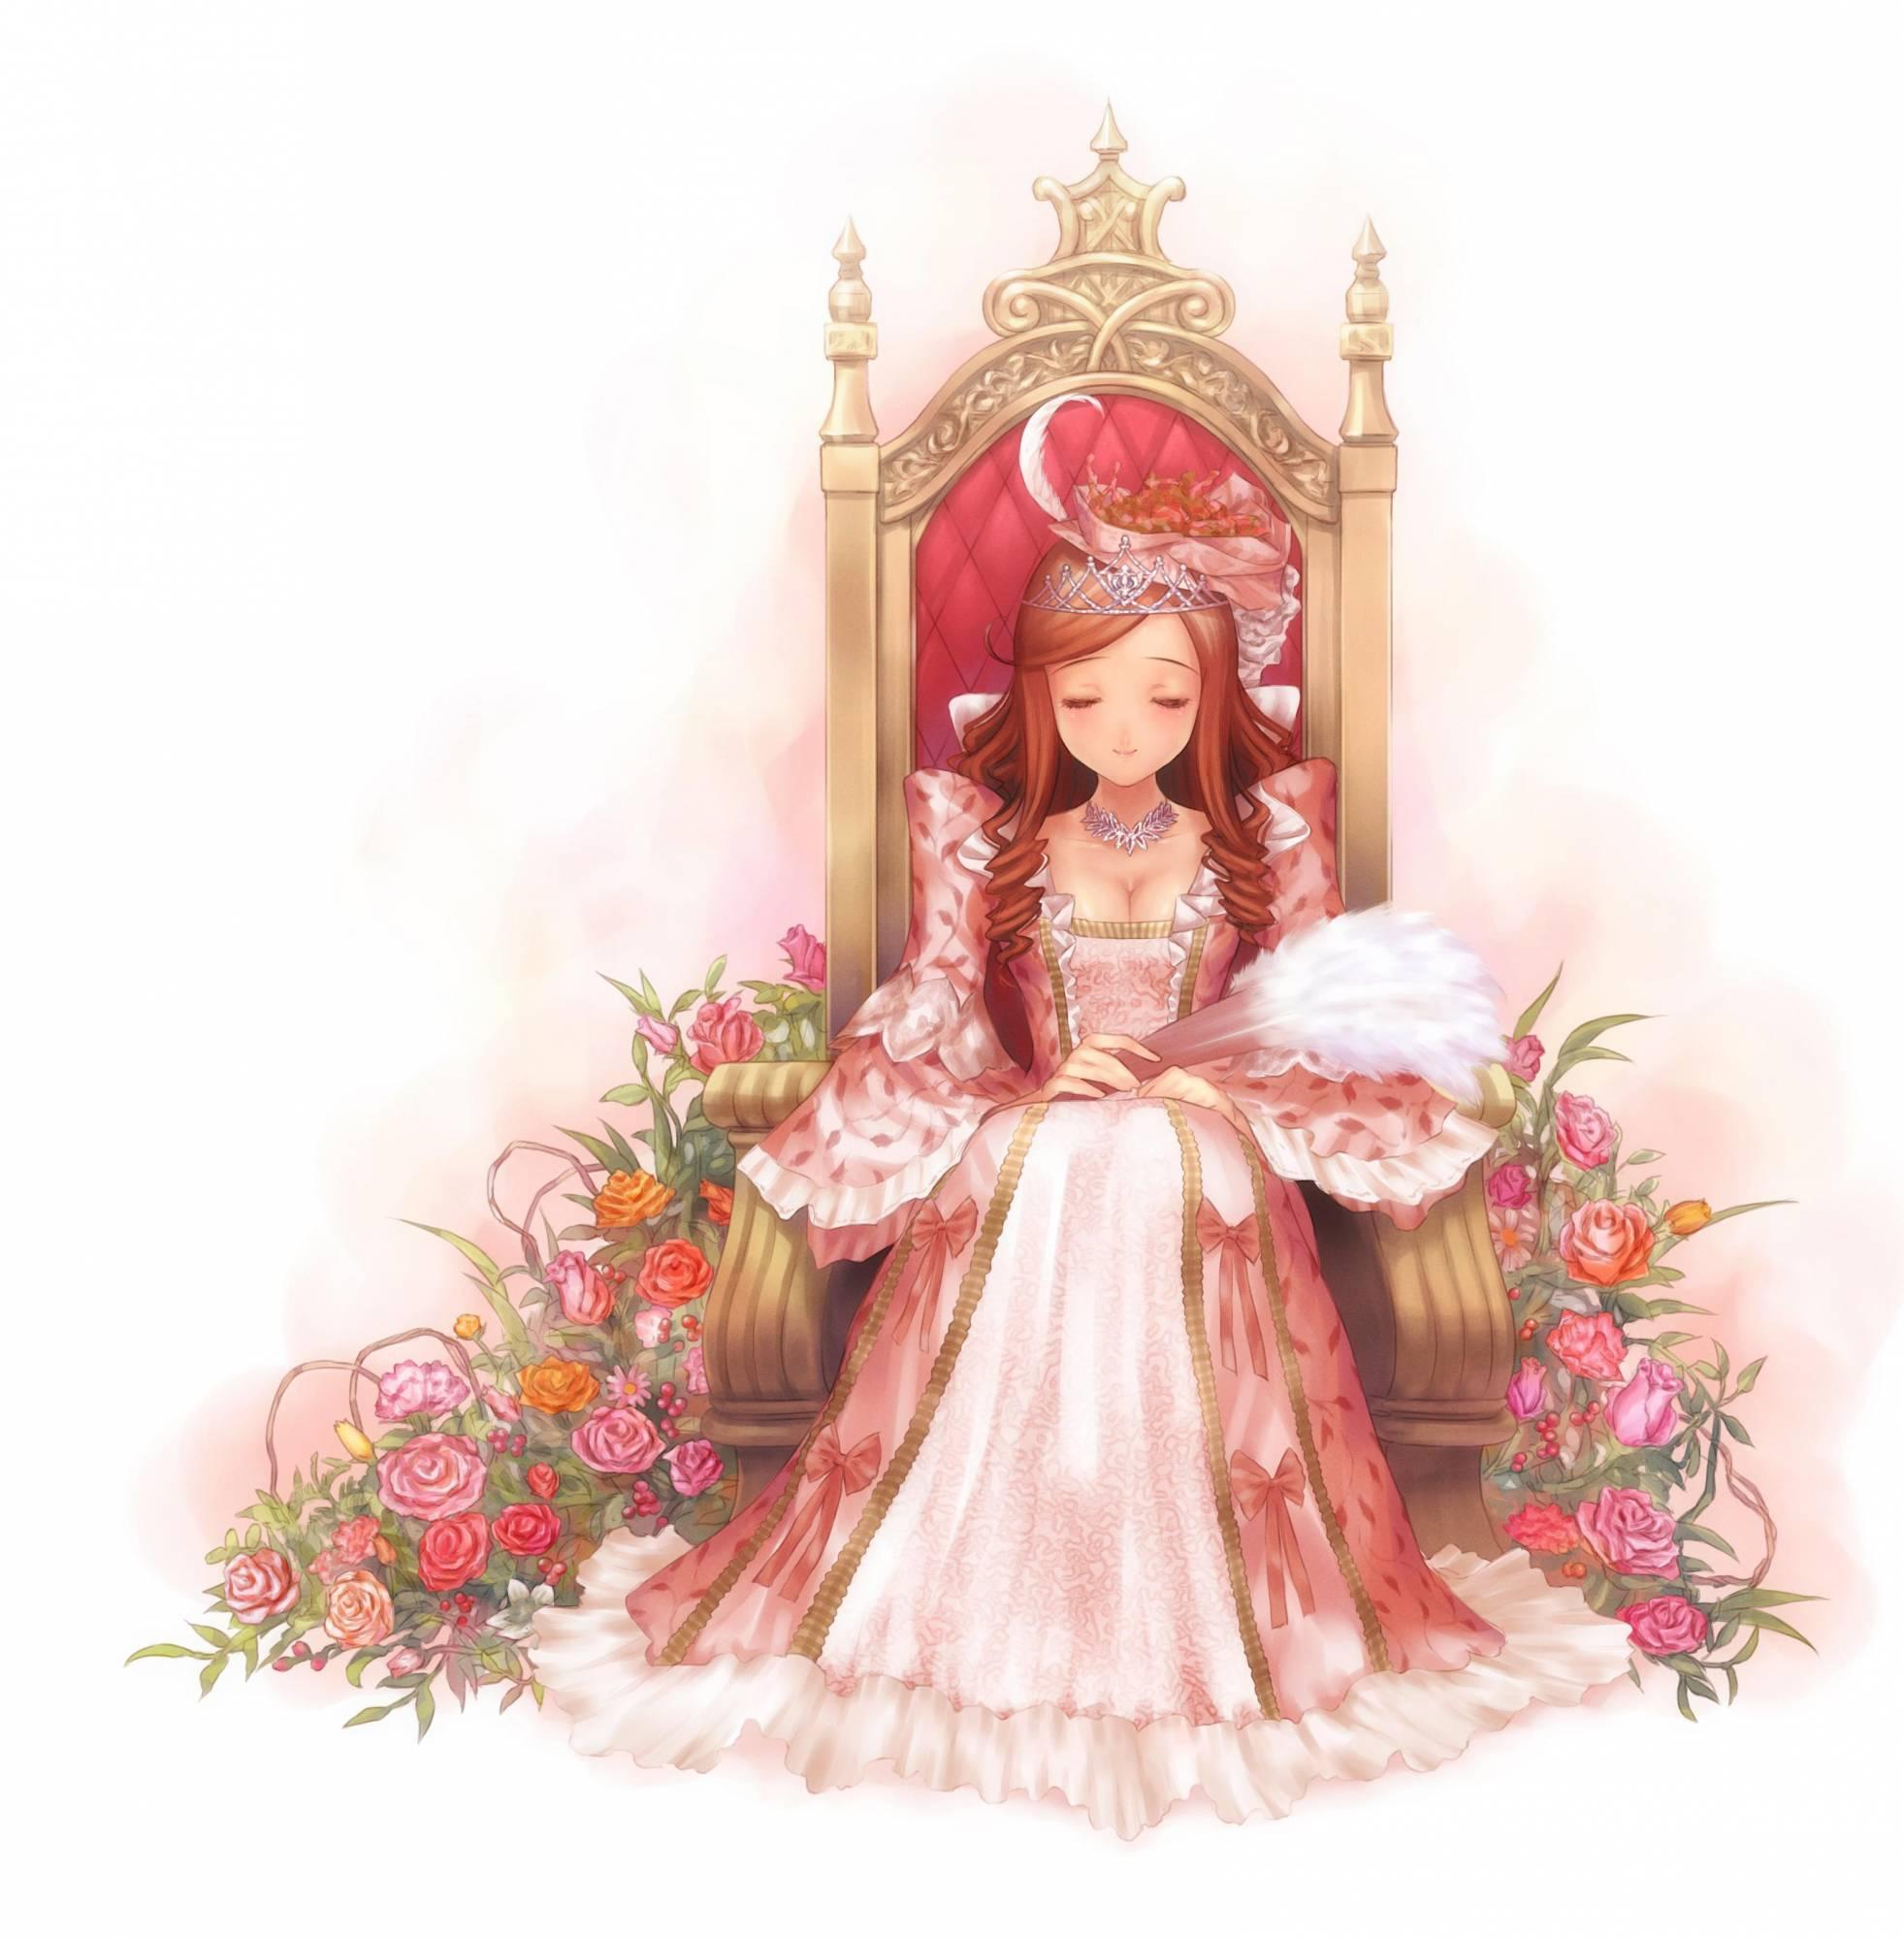 Принцесса несмеяна ххх онлайн 16 фотография